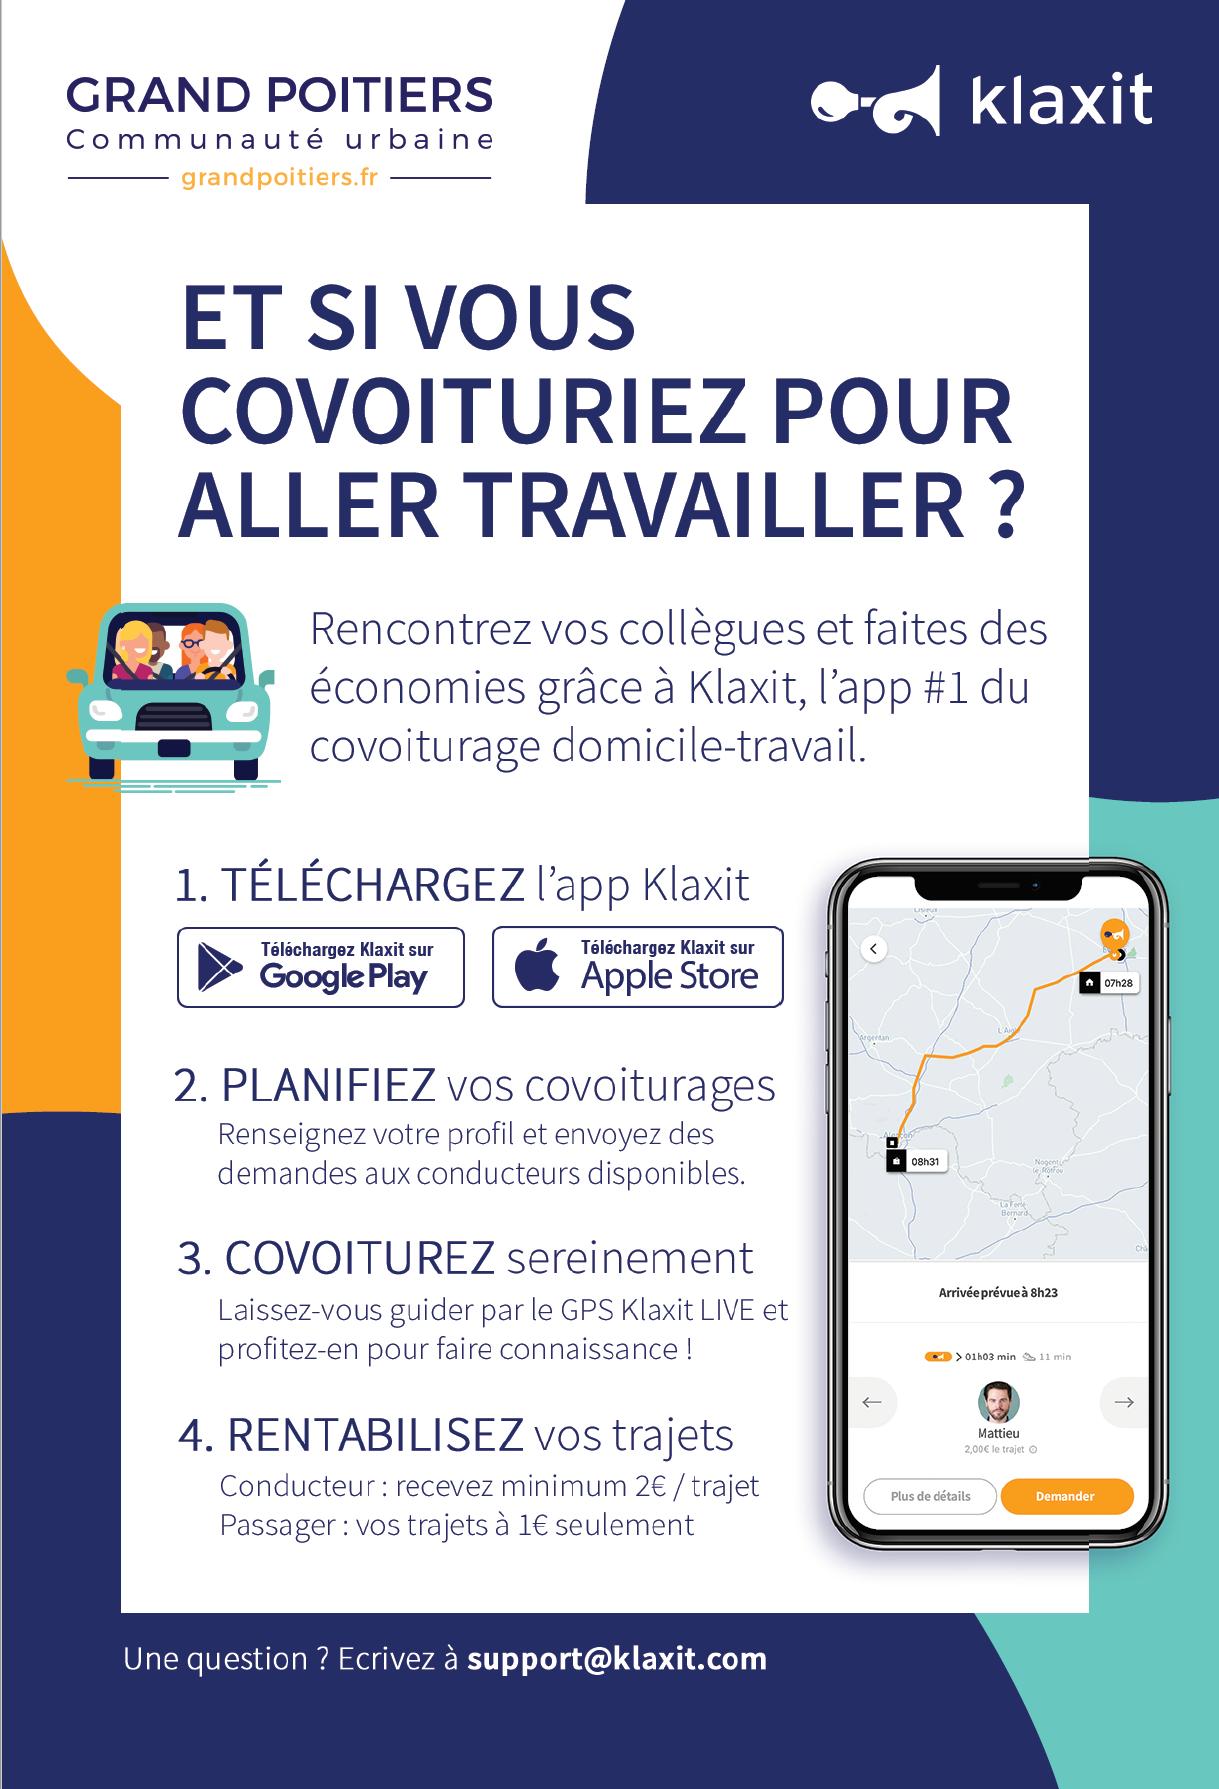 Grand Poitiers – Covoiturage domicile travail